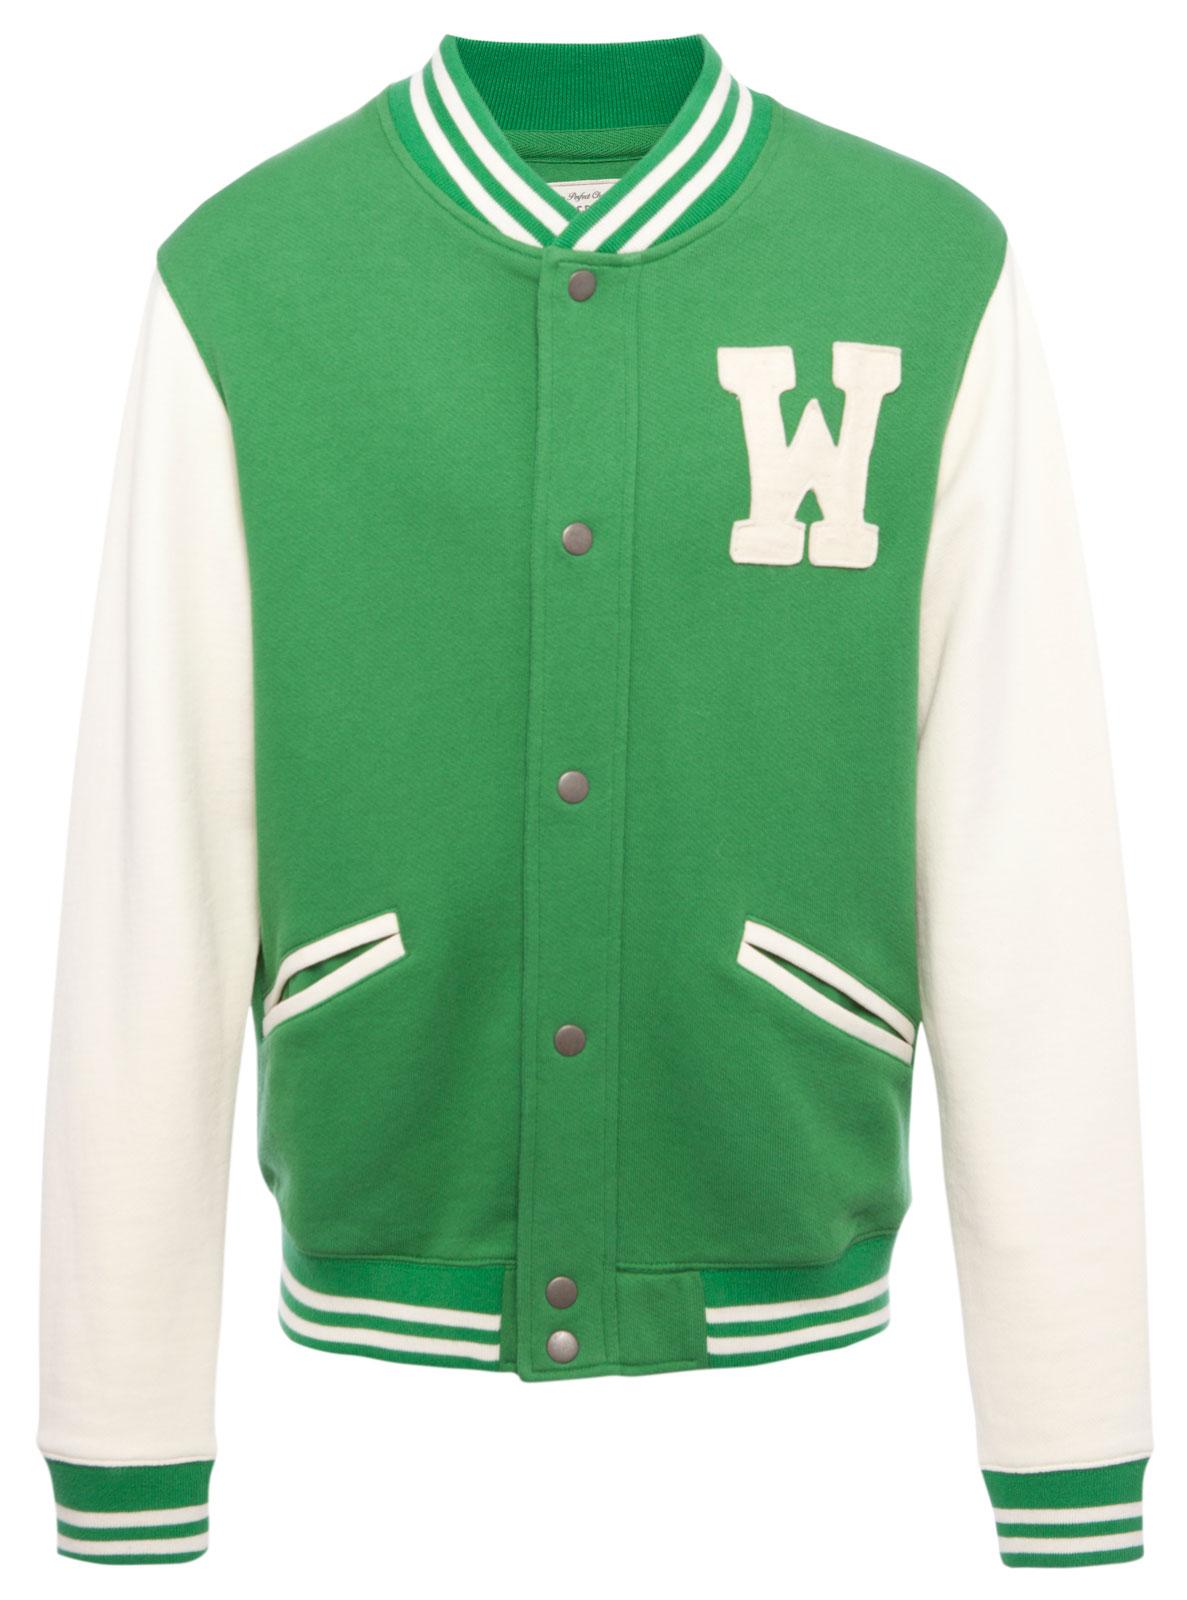 Green Jackets Baseball - My Jacket